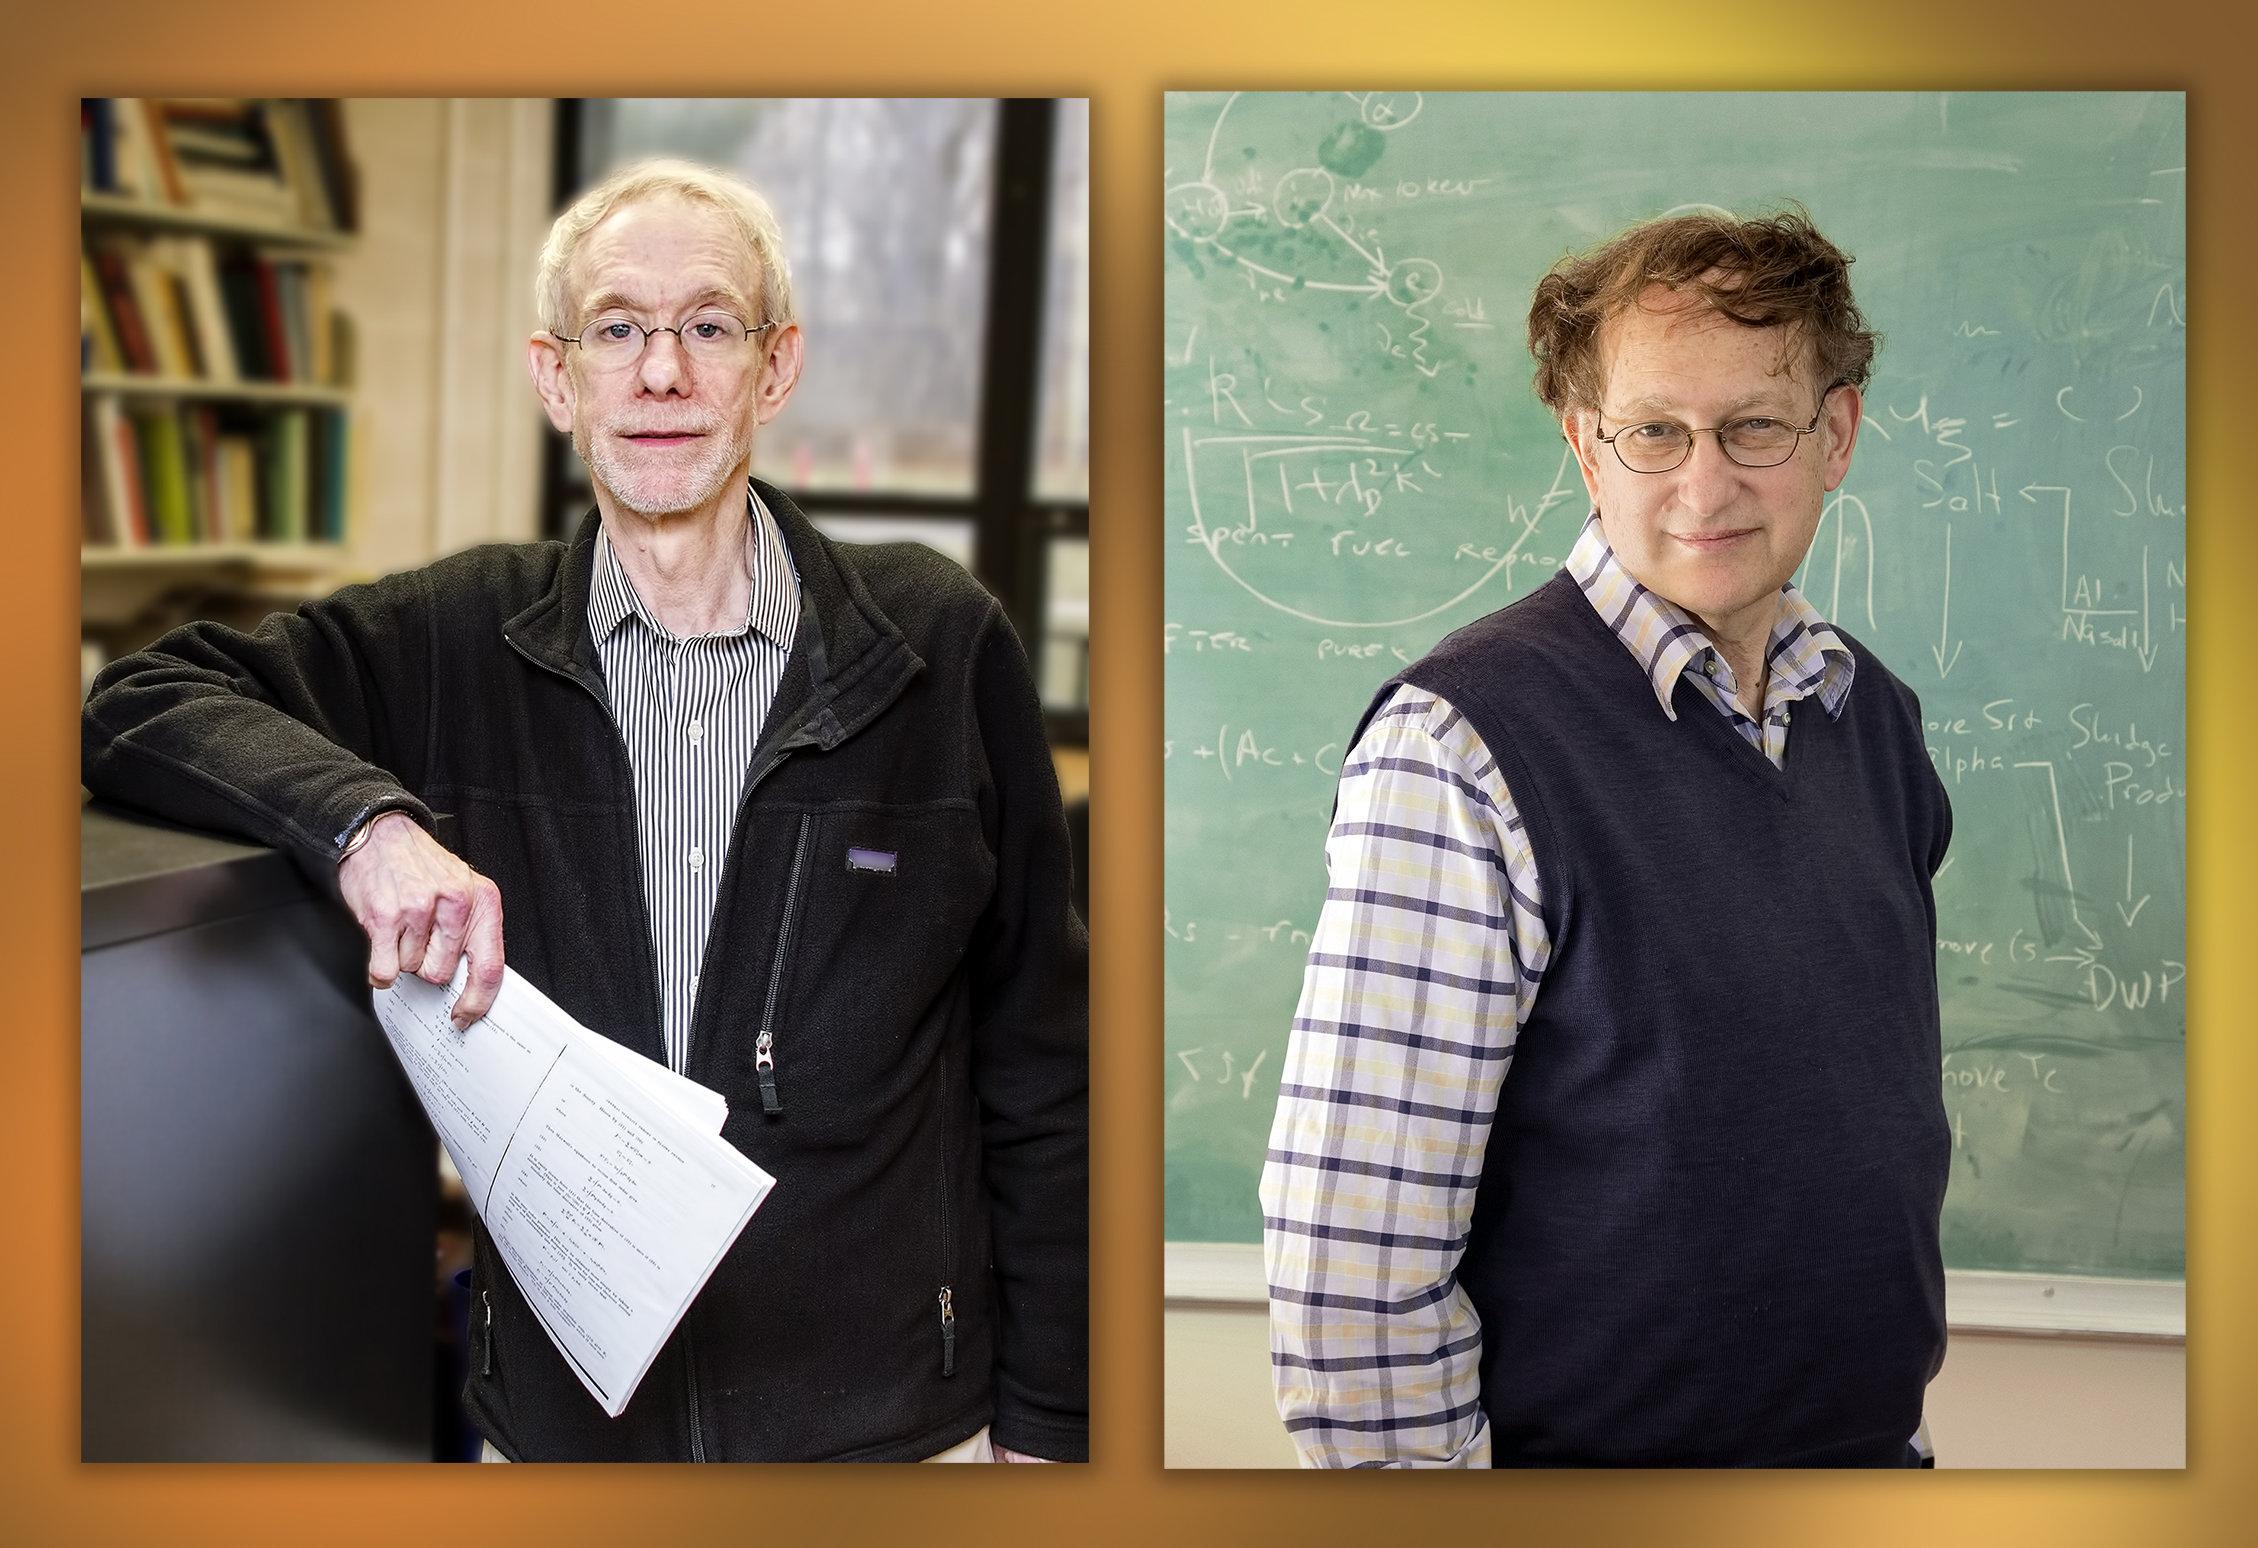 Vlevo Allan Reiman, vpravo jeho kolega Nat Fisch. Kredit: Elle Starkman/PPPL Office of Communications.